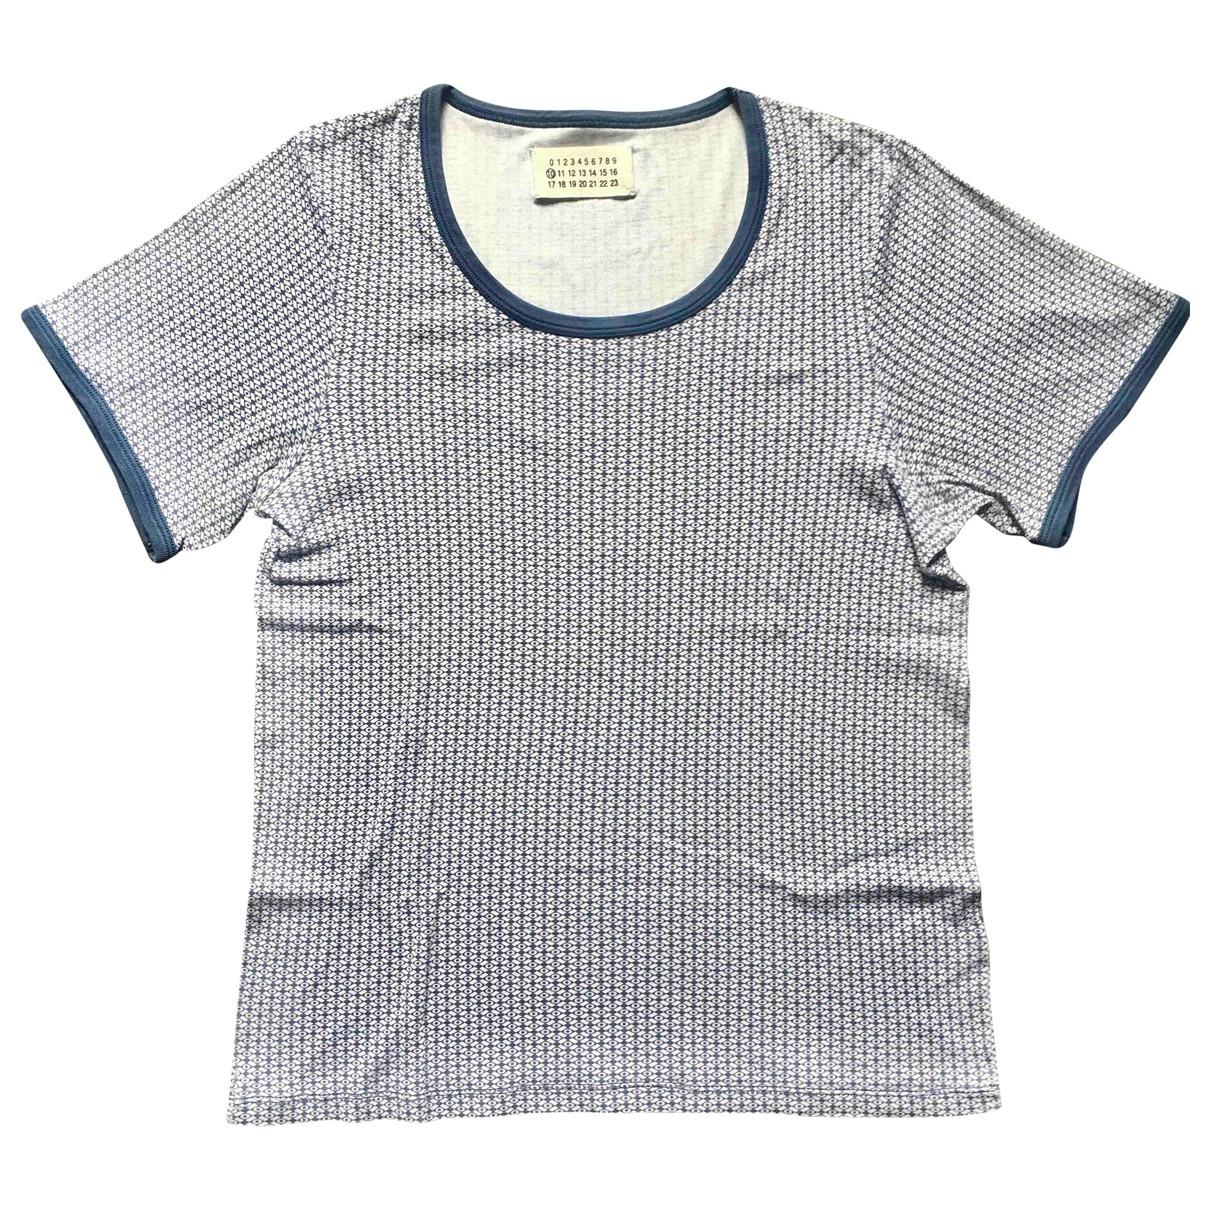 Maison Martin Margiela - Tee shirts   pour homme en coton - bleu